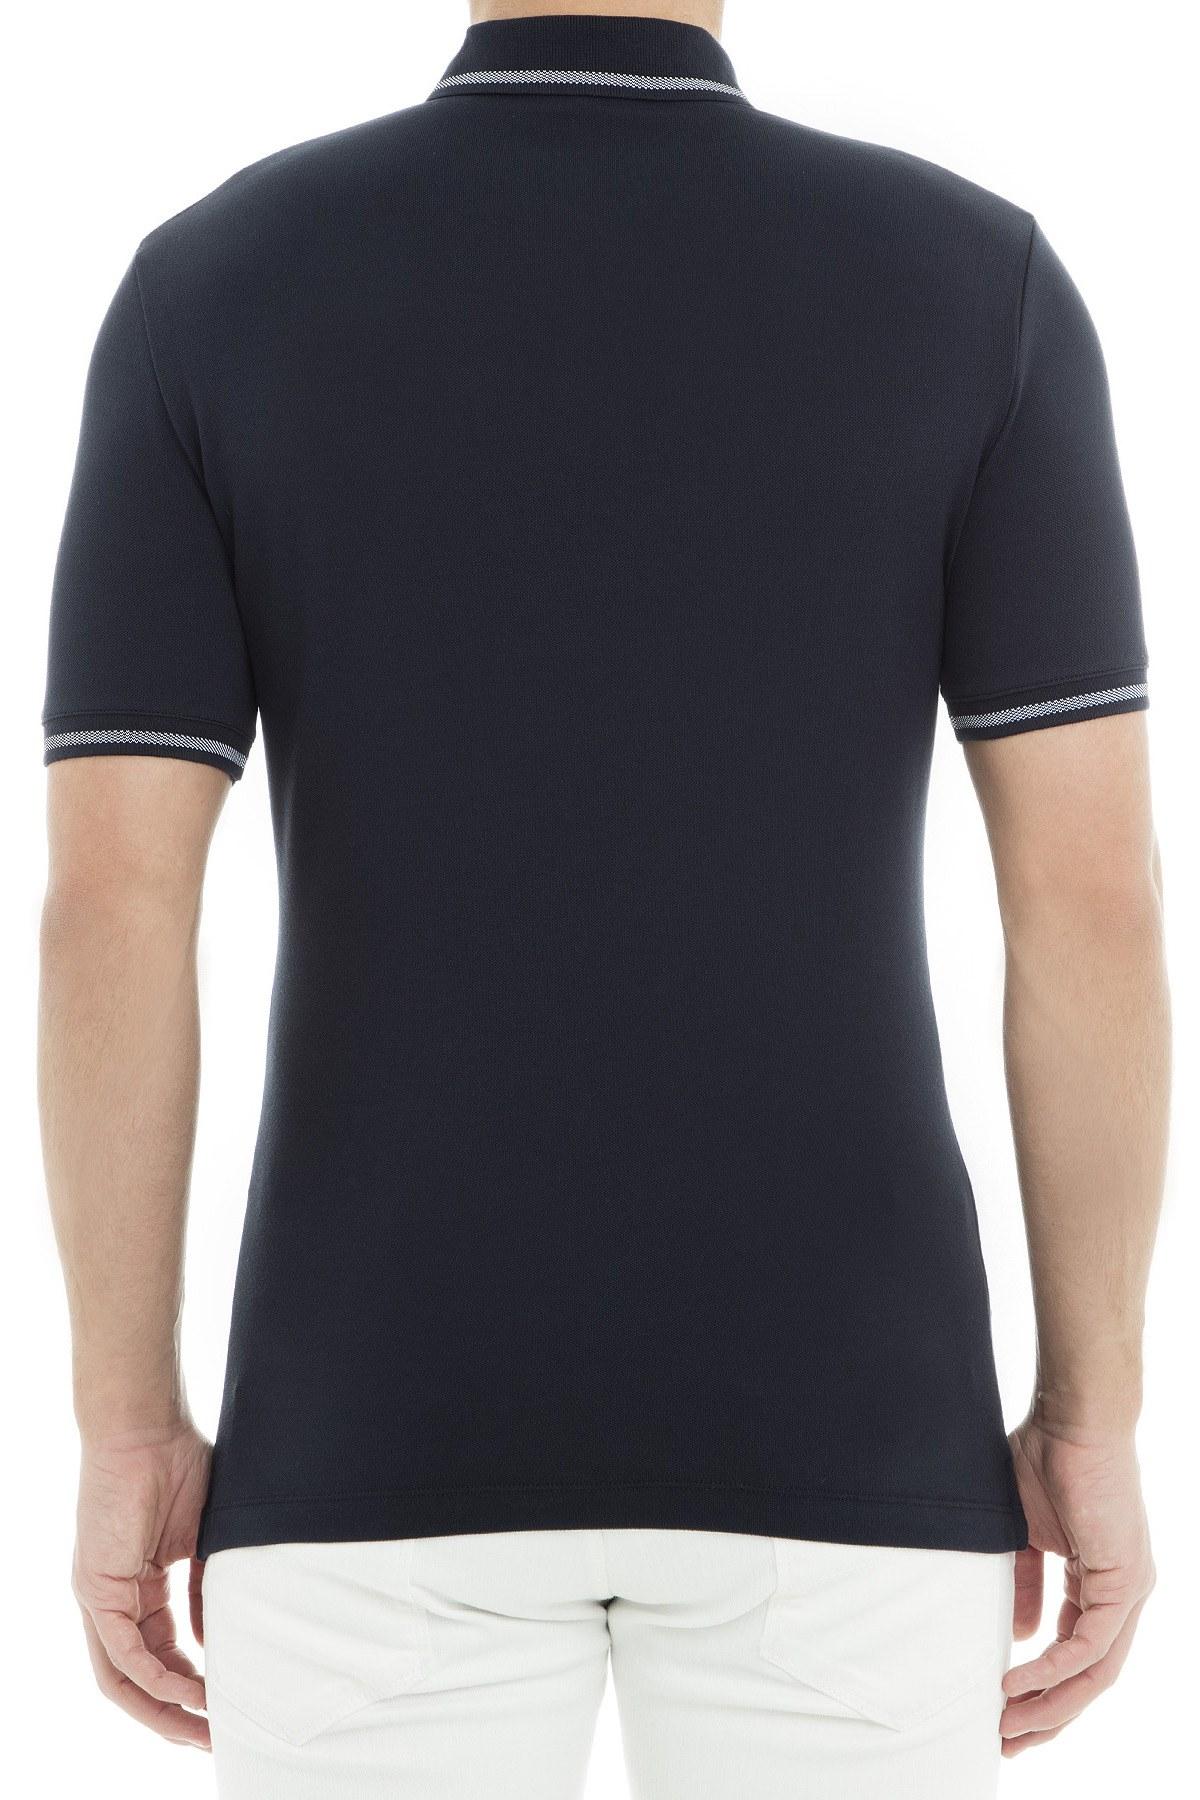 Emporio Armani Polo Erkek T Shirt 3G1F93 1JPTZ 0922 LACİVERT